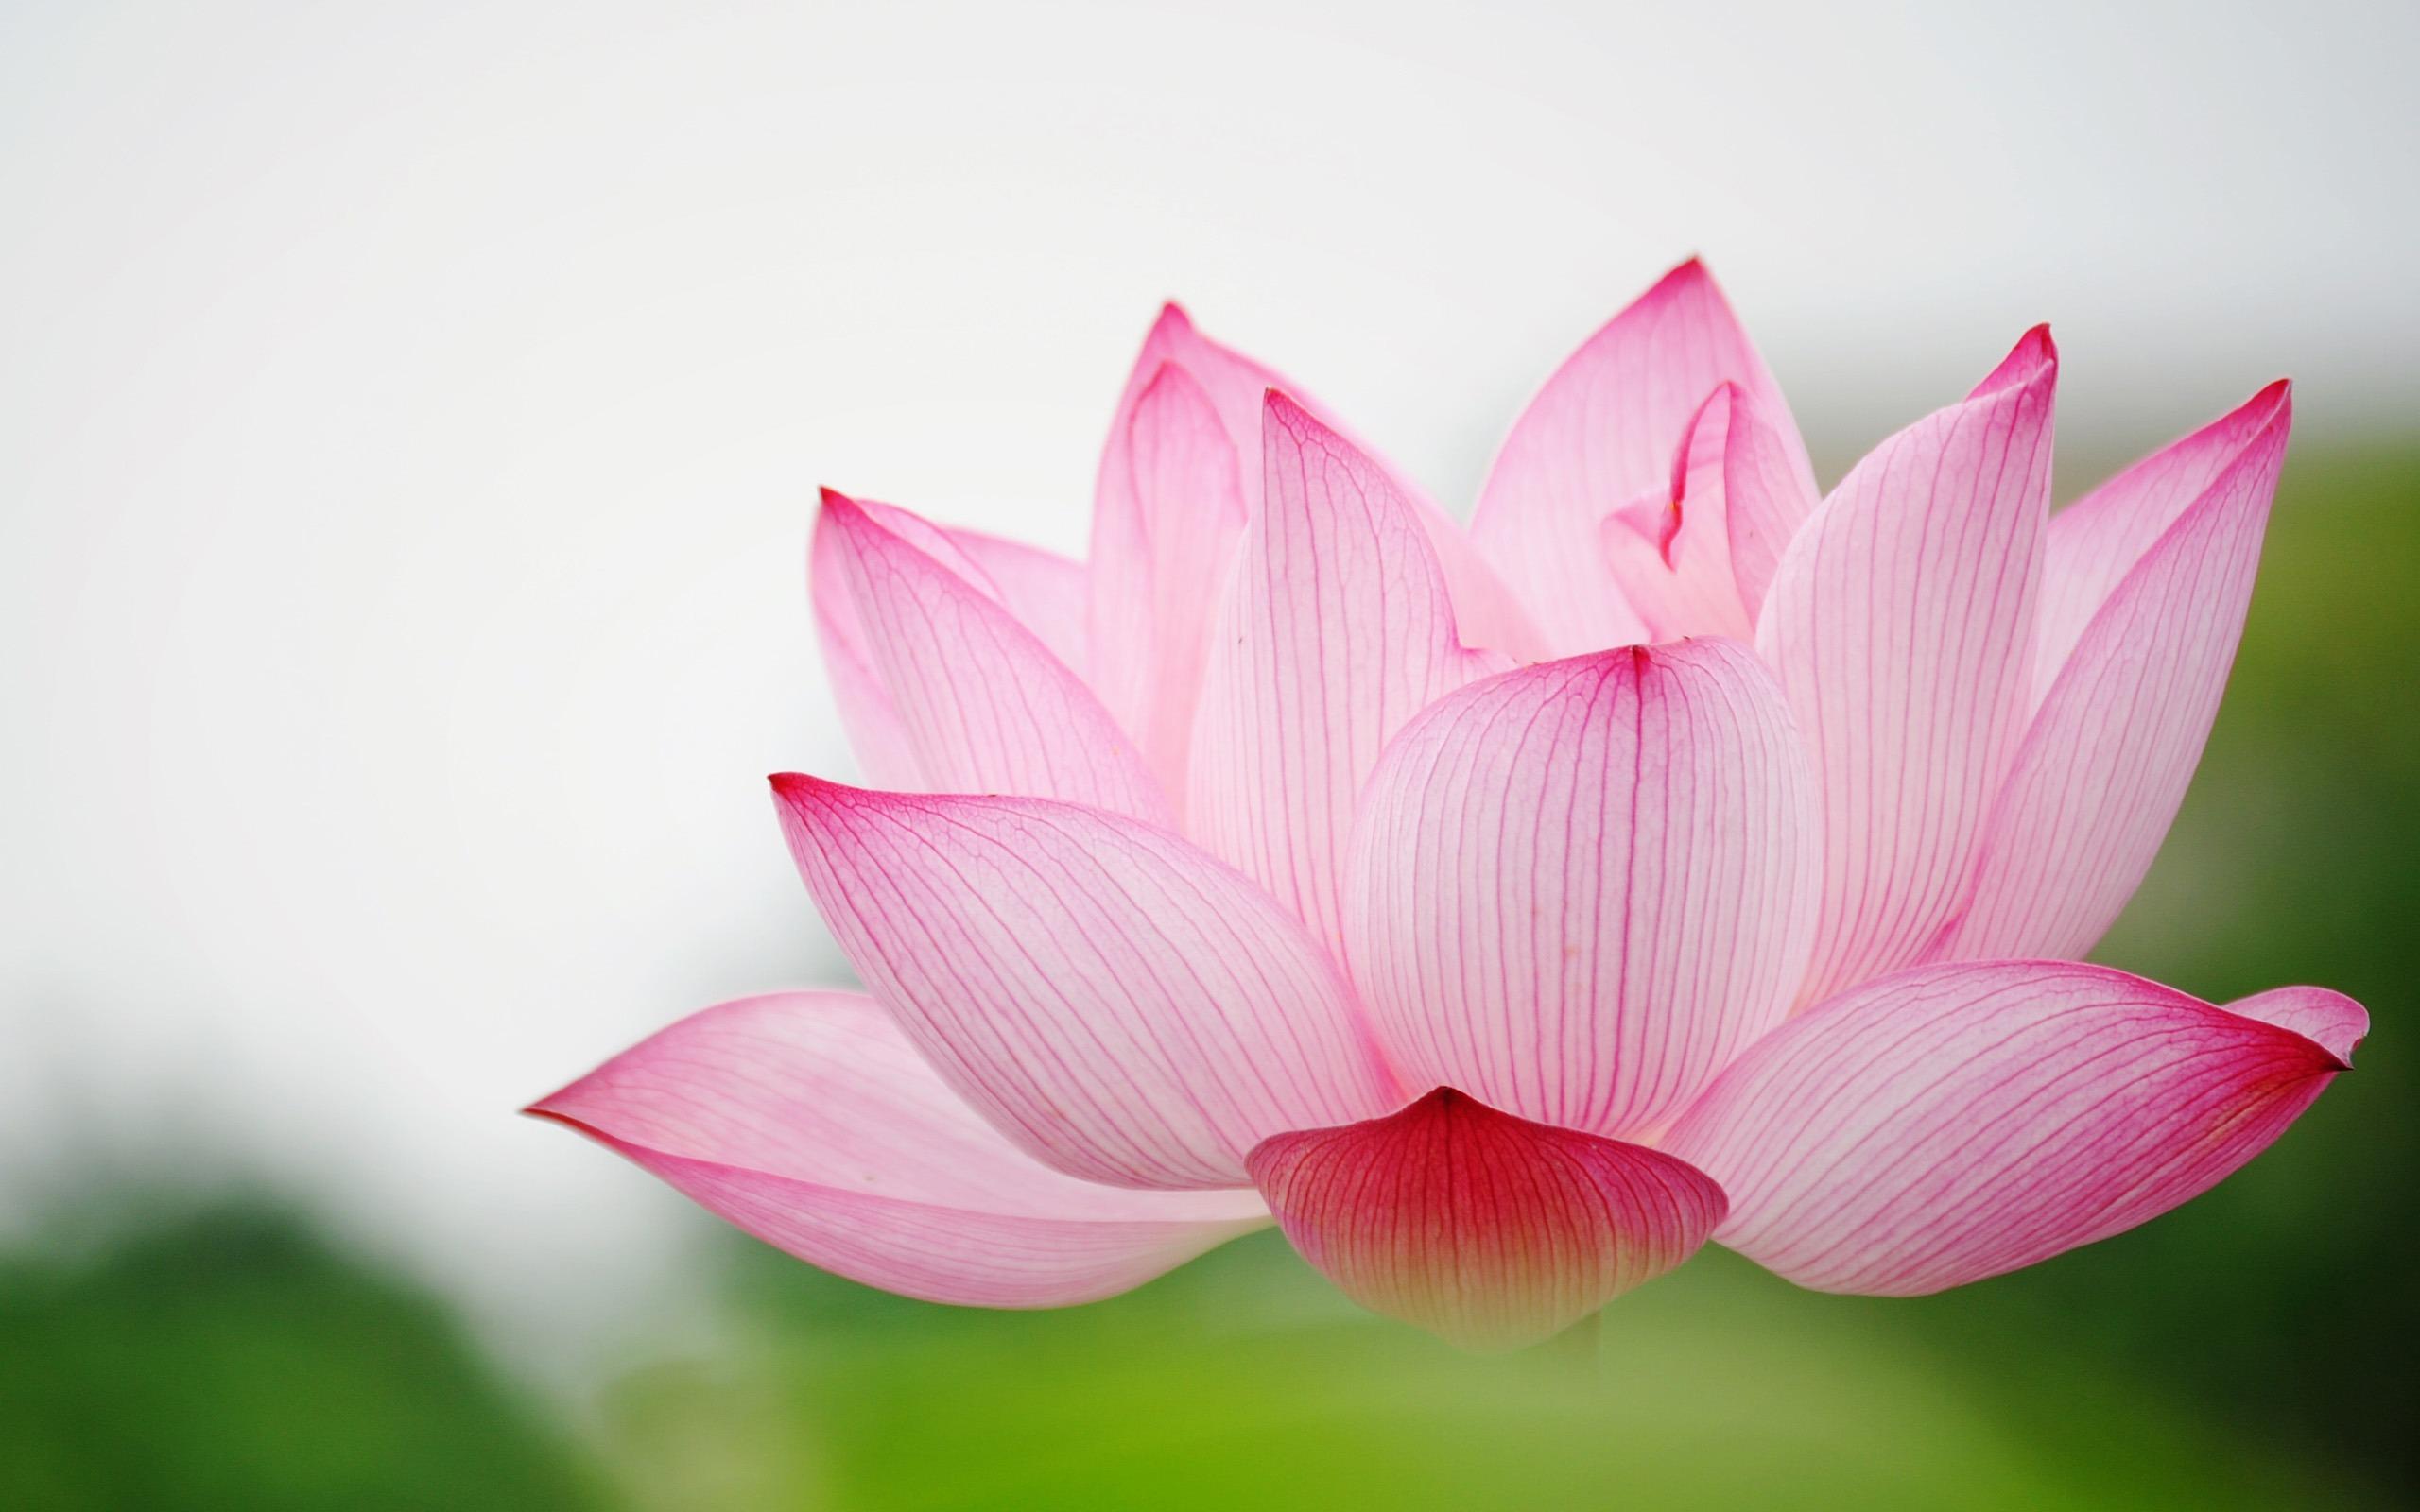 flower garden love pink lily lotus hd wallpaper wallpaper background